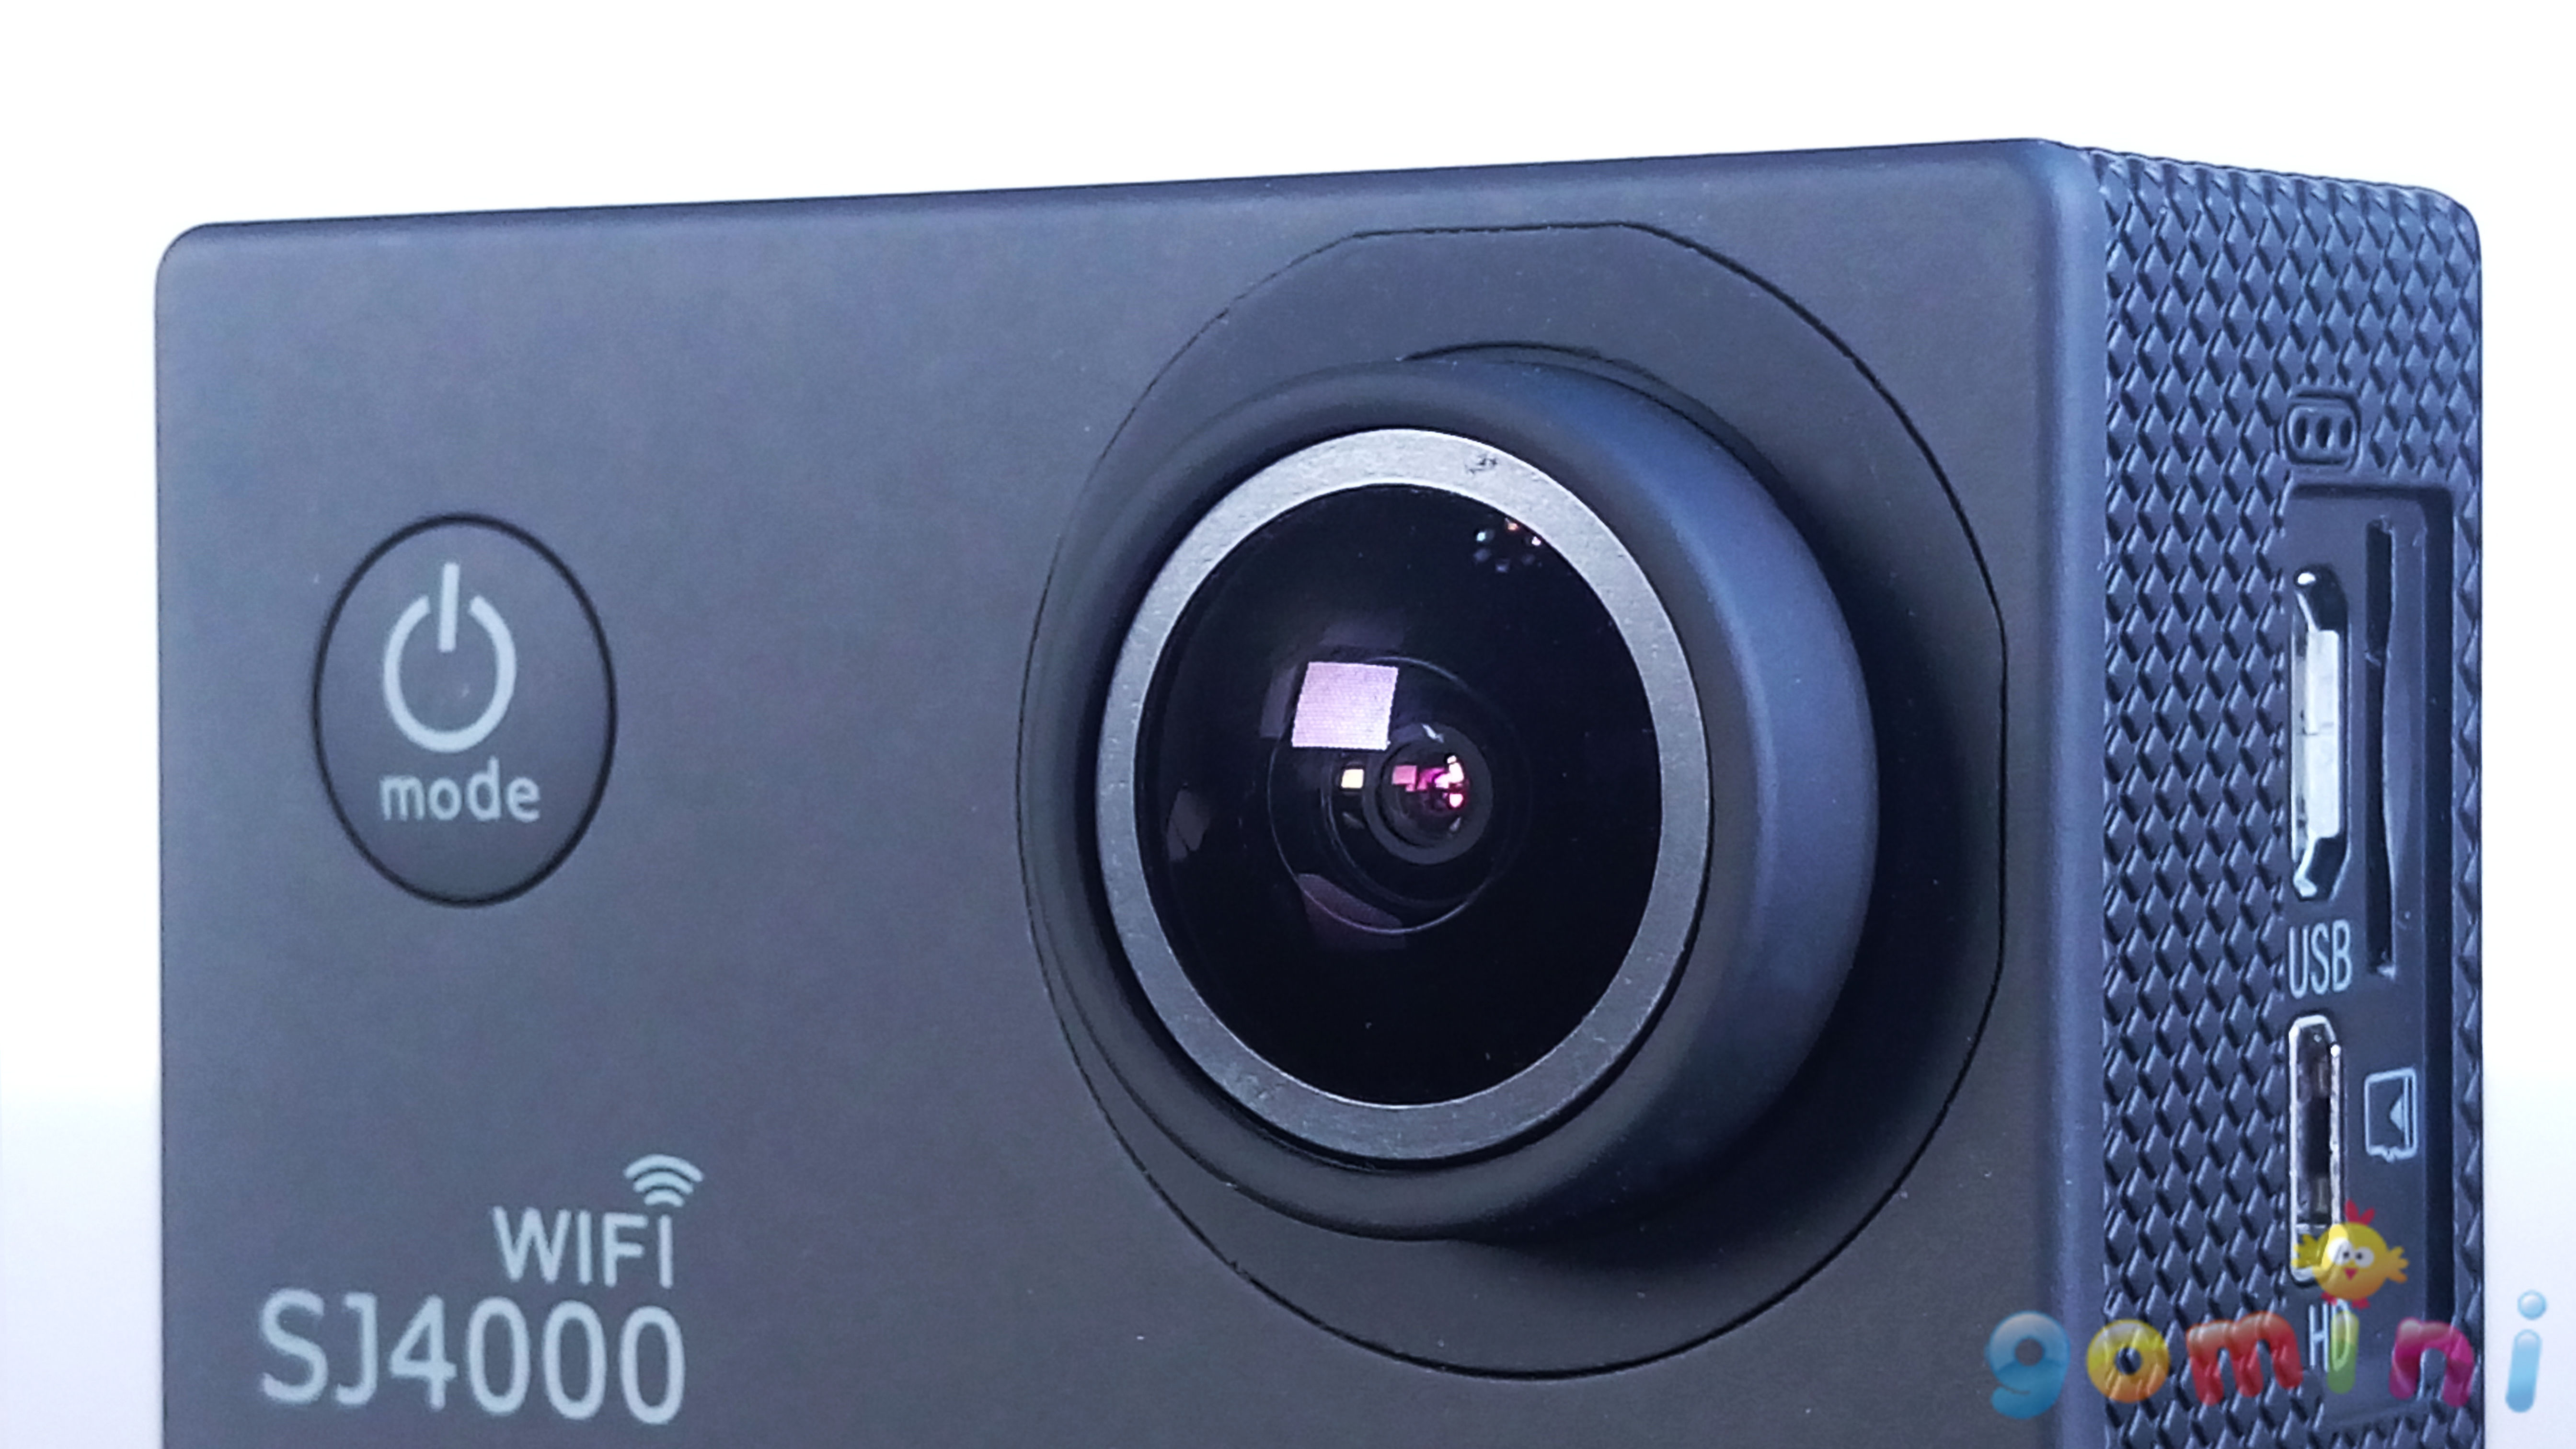 SJ4000 WIFI鏡頭近拍.jpg